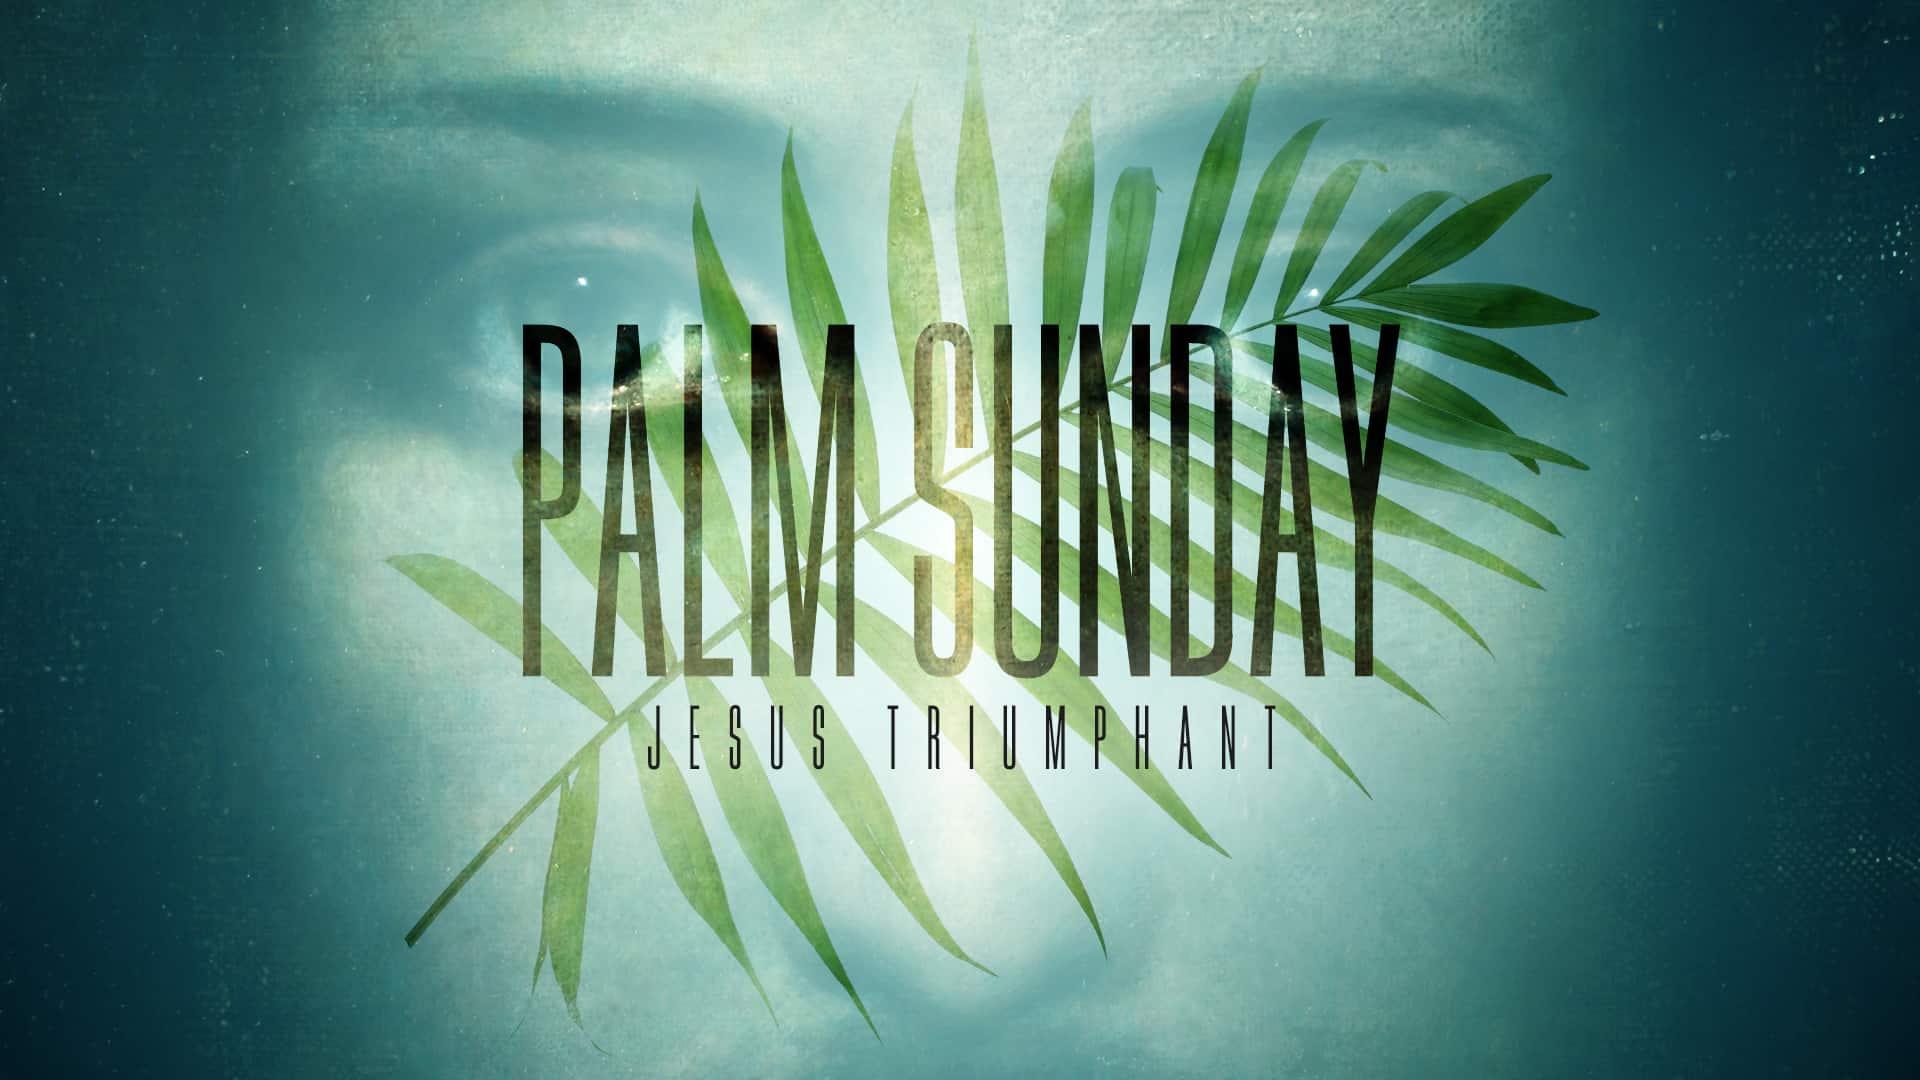 Palm Sunday Graphic Pack • Freebridge Media